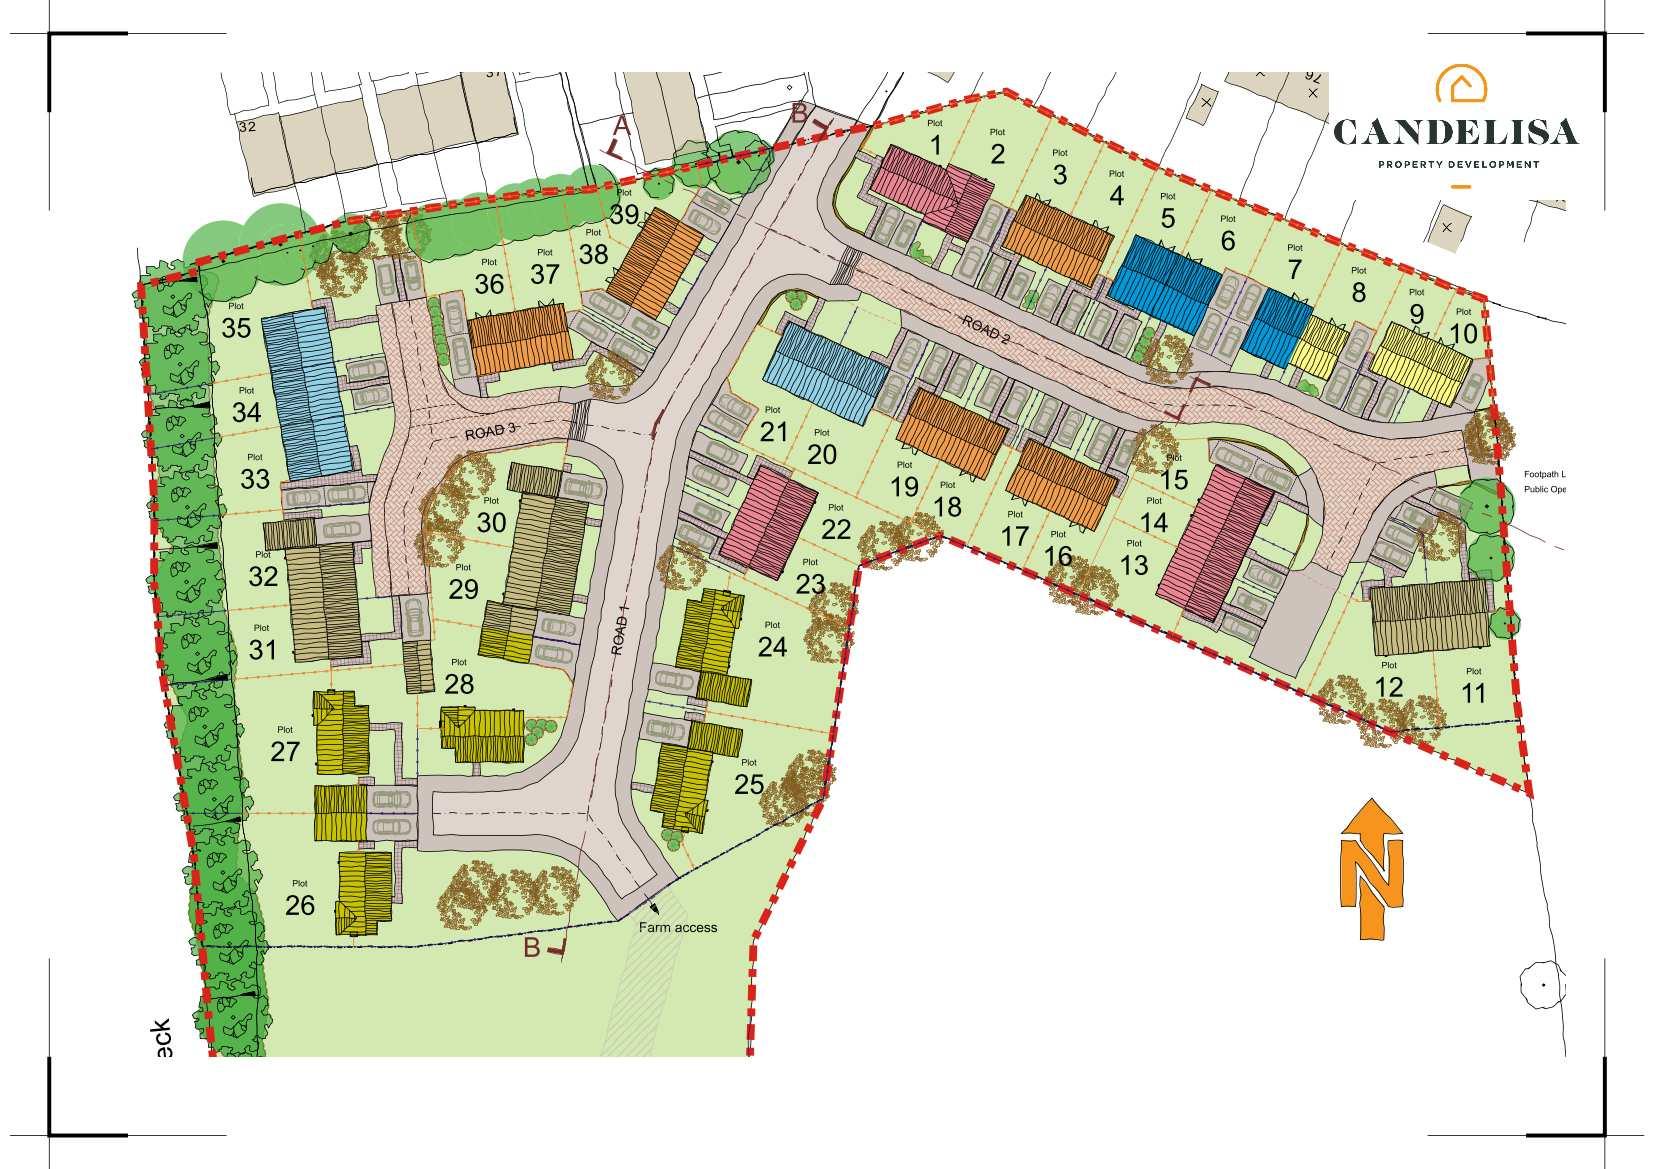 Candelisa - Site Plan C_Web Site Image